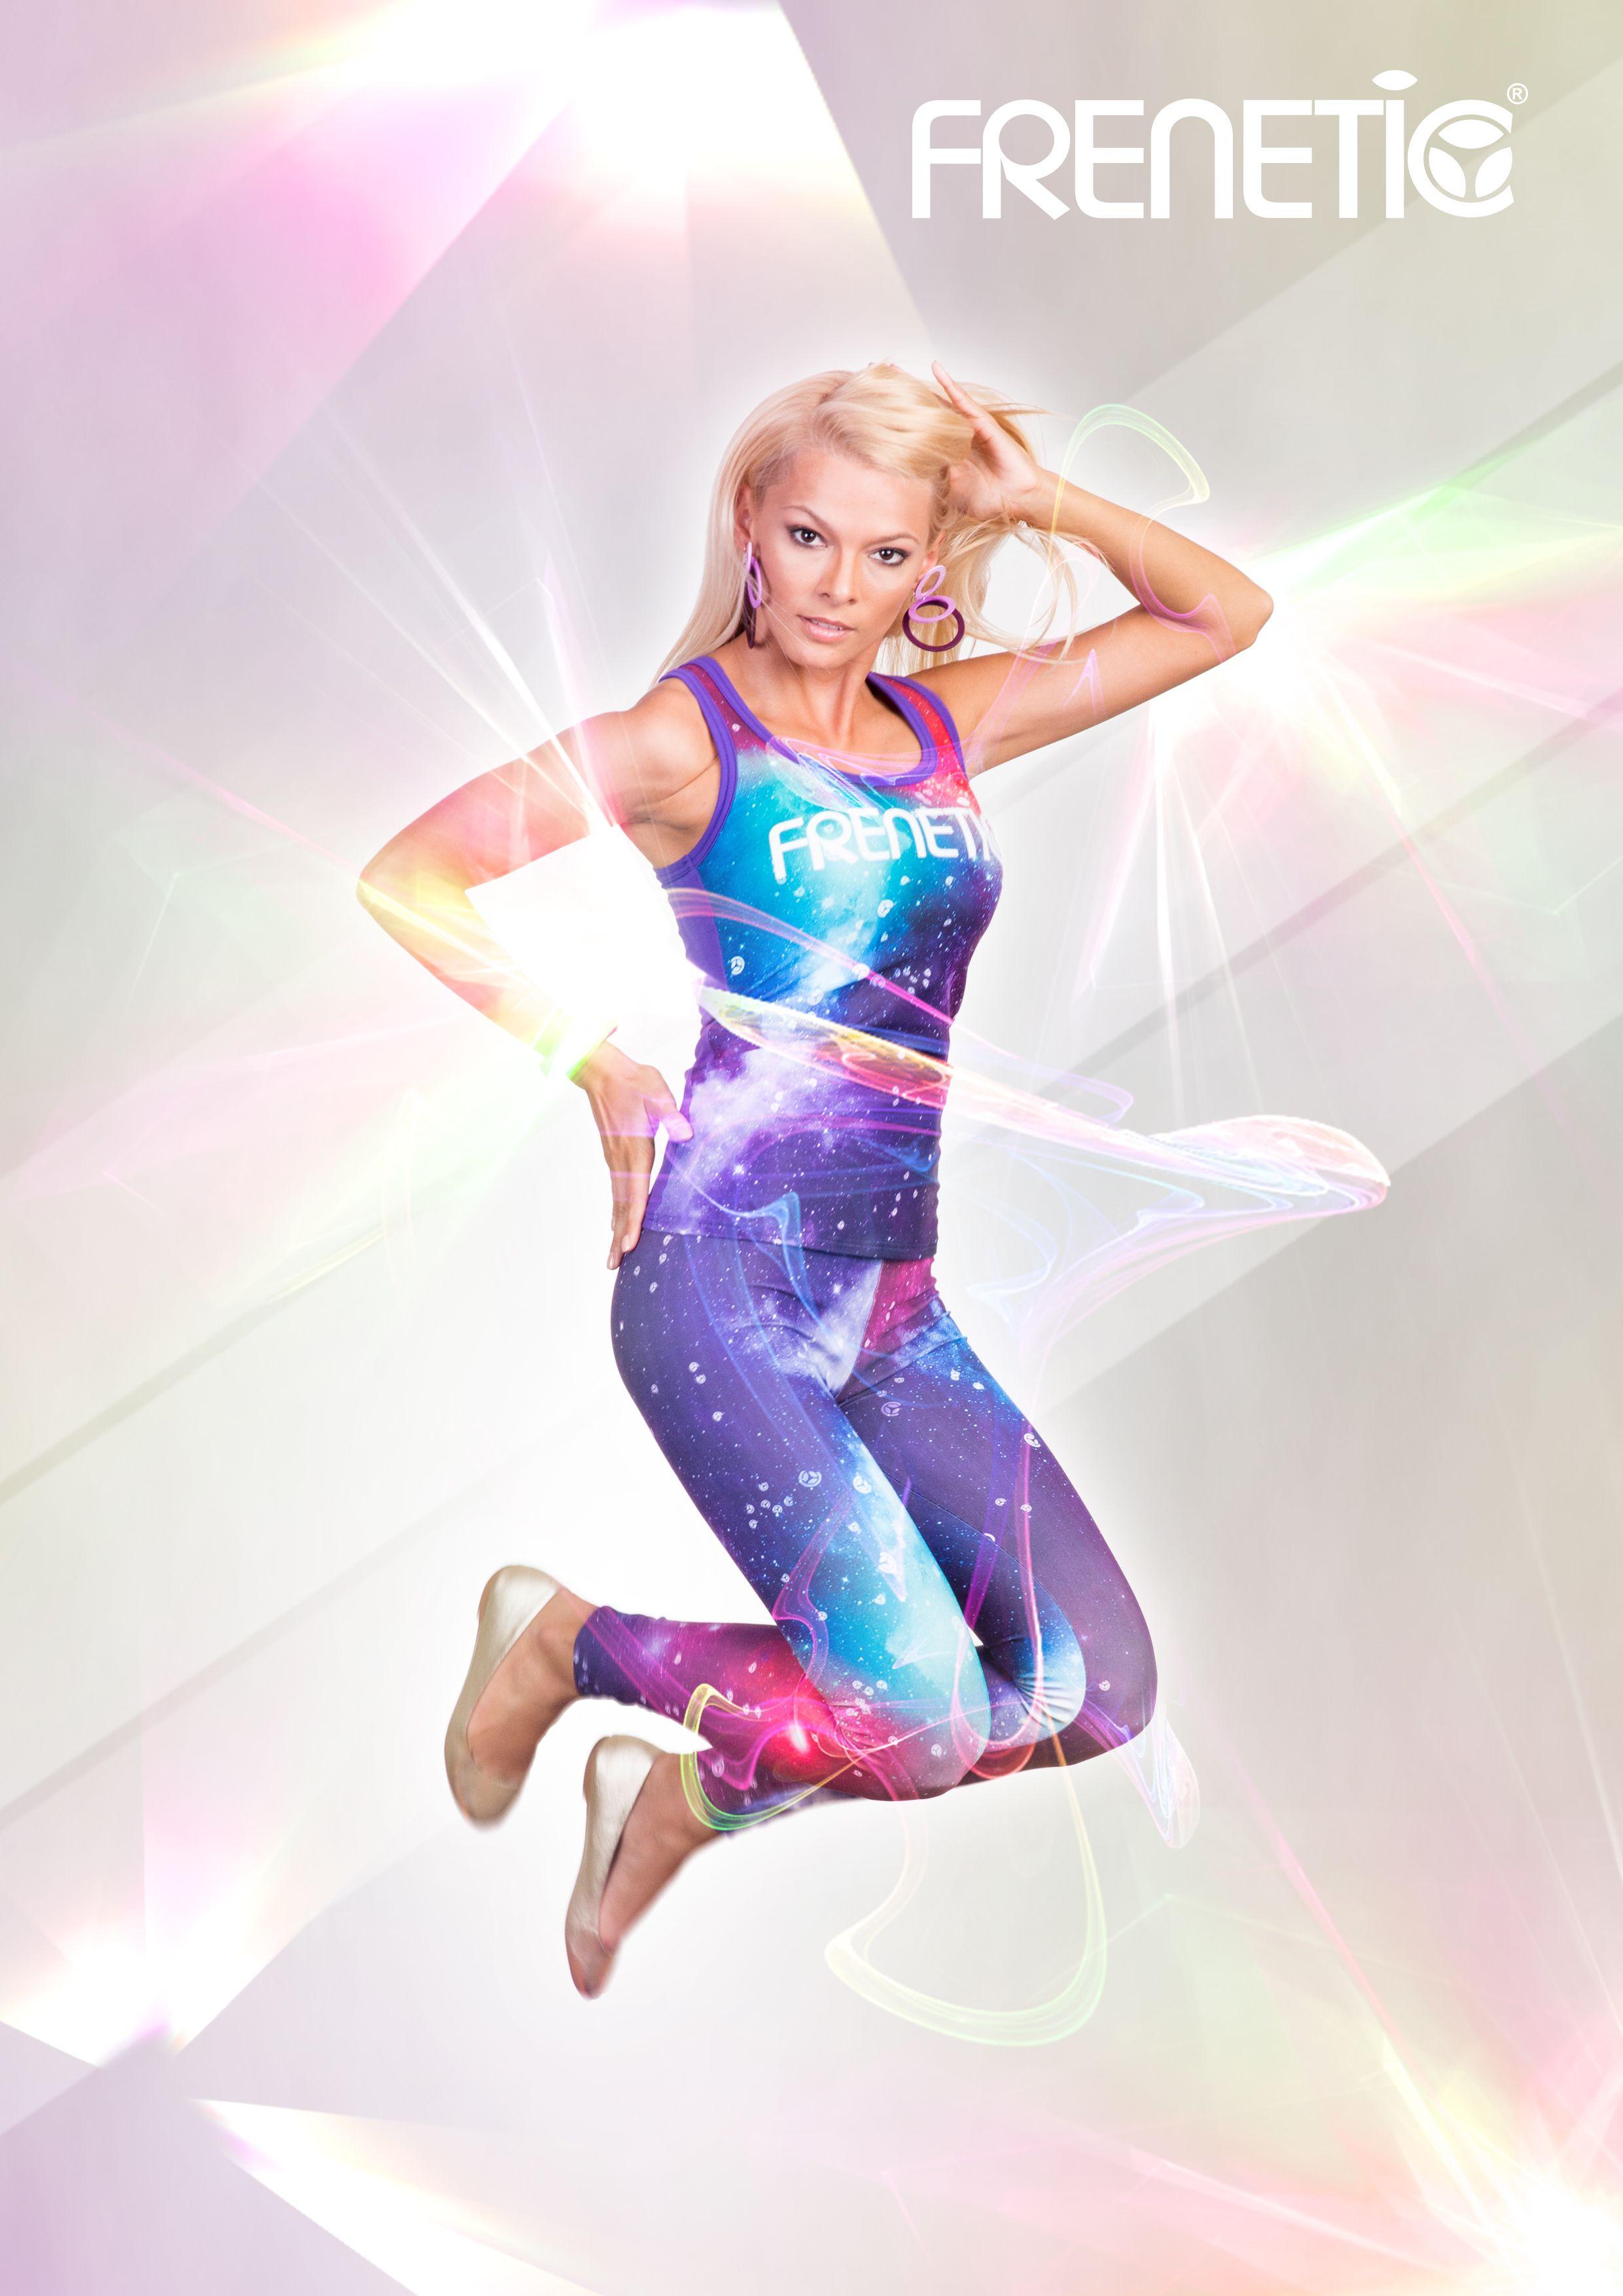 f5e01c261a Frenetic Fitness Clothes (freneticsport) on Pinterest